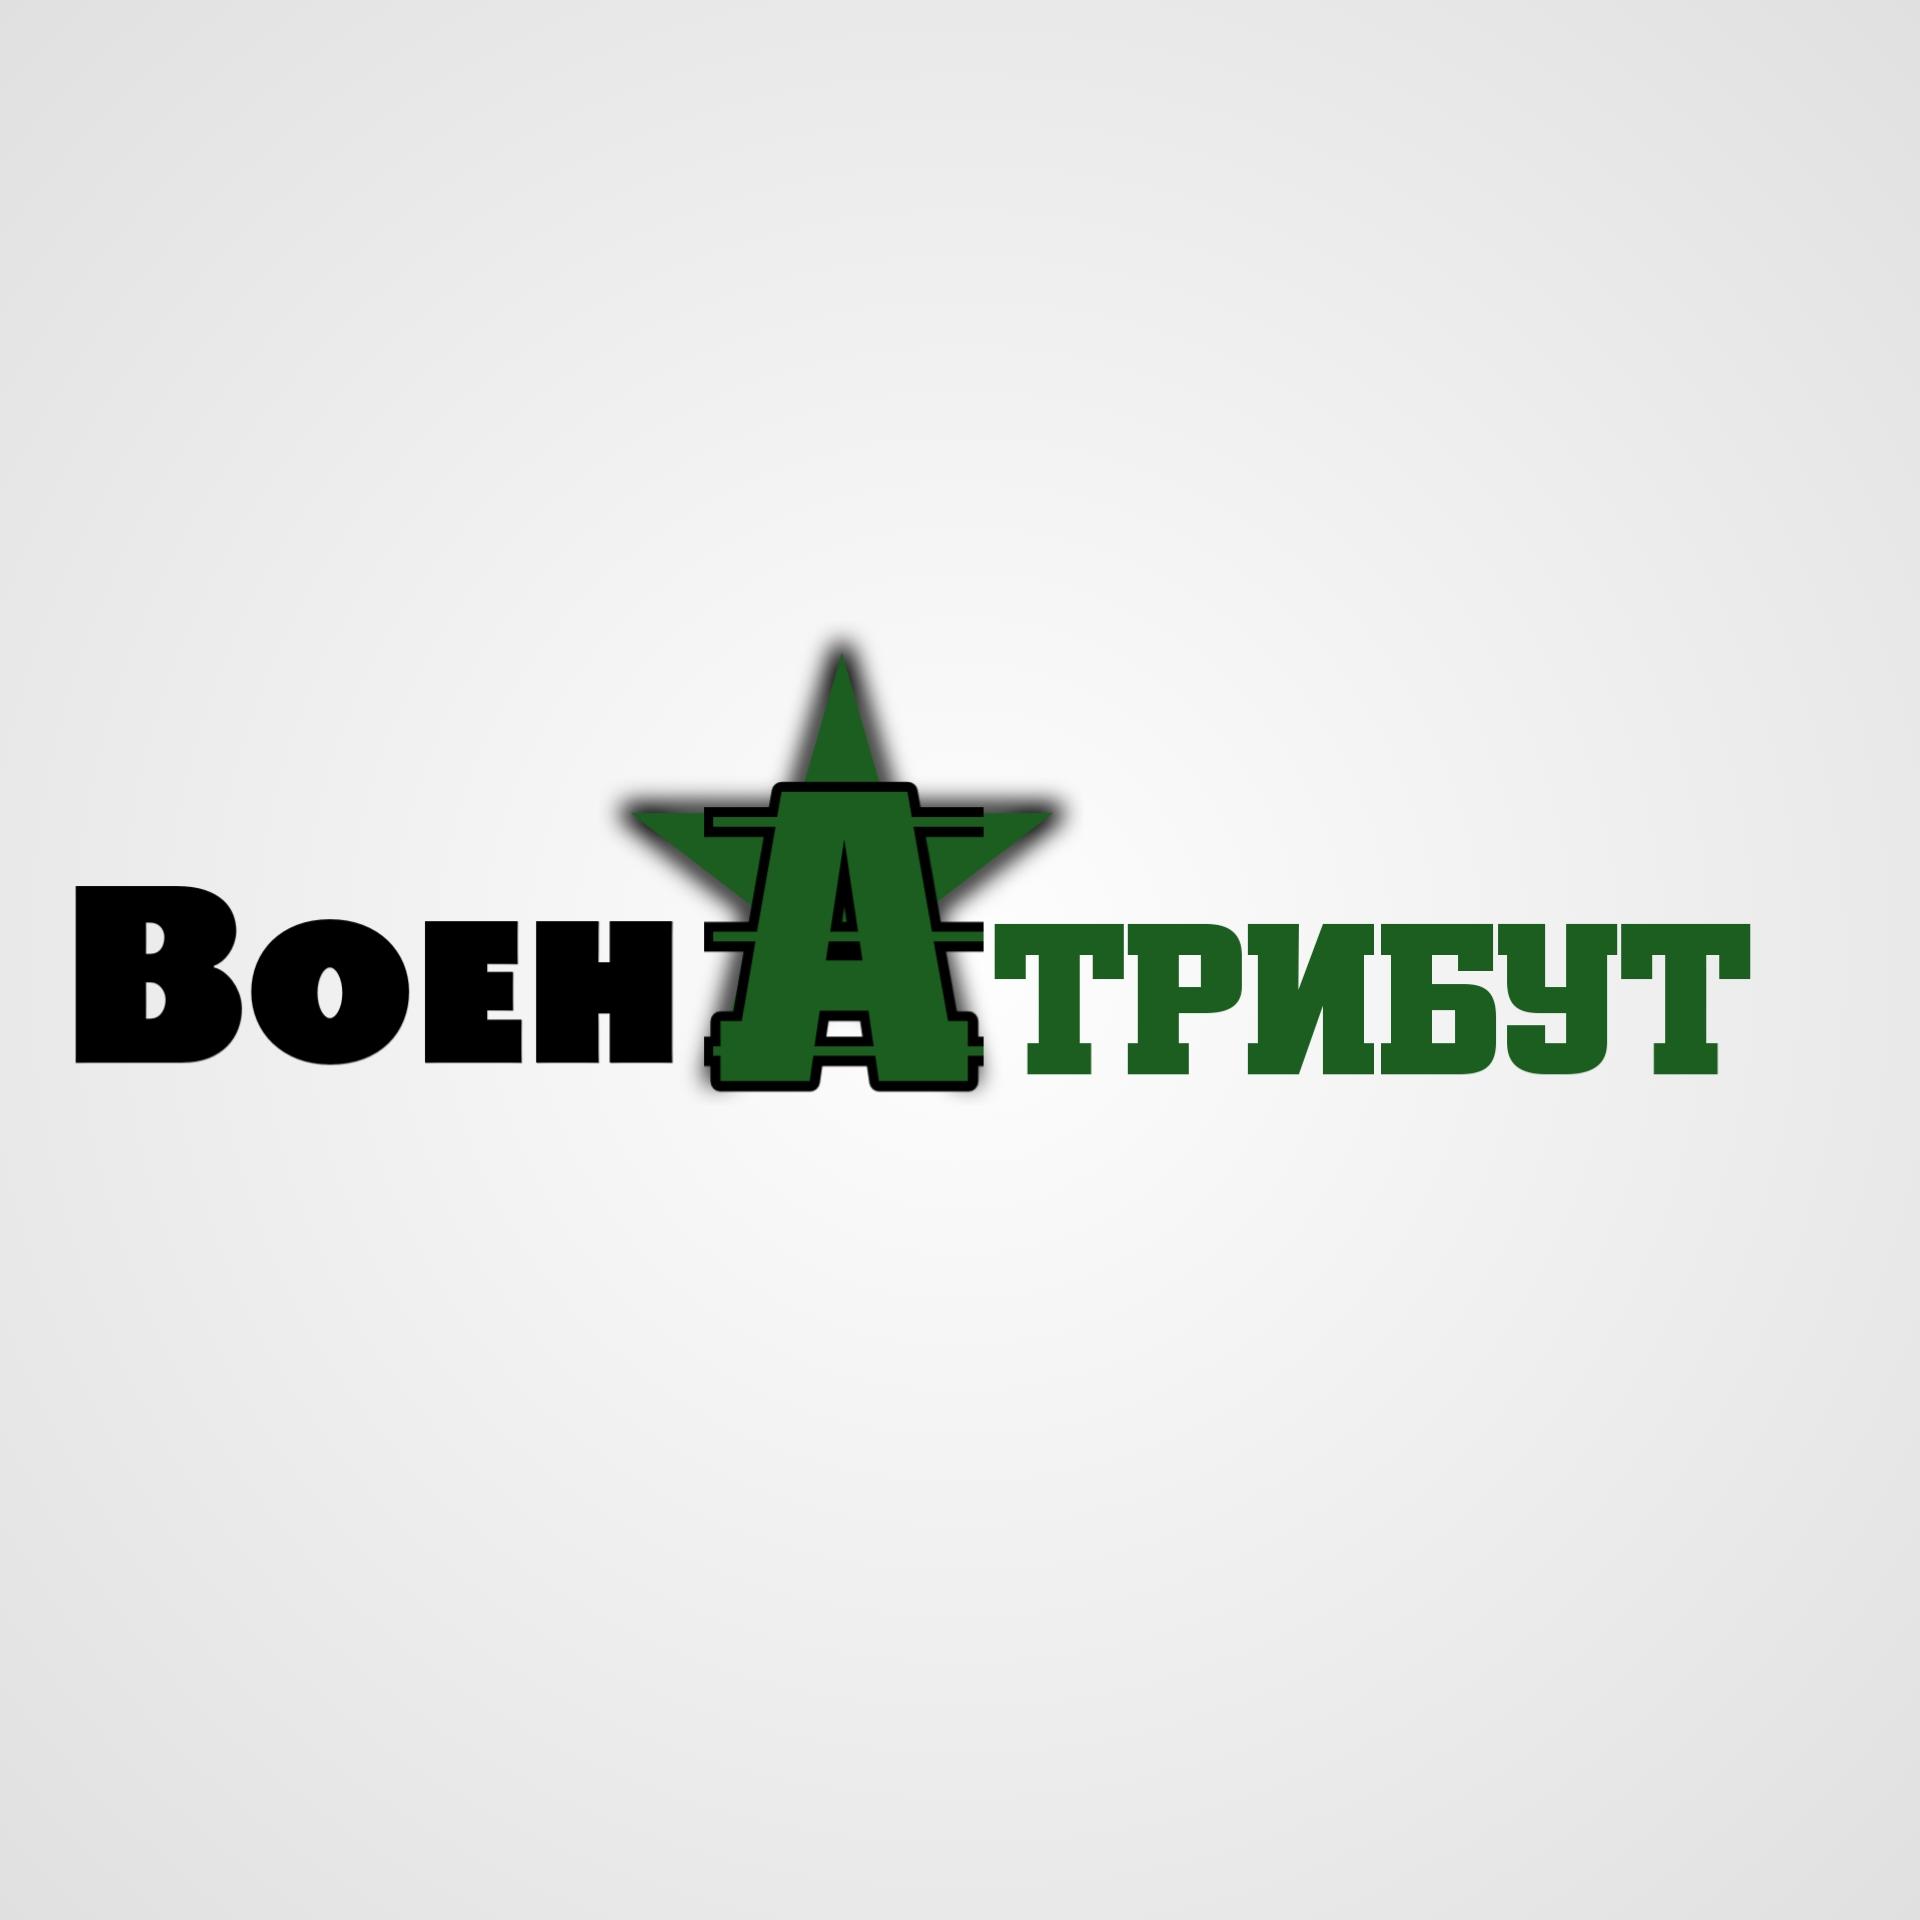 Разработка логотипа для компании военной тематики фото f_287601c39474f535.jpg